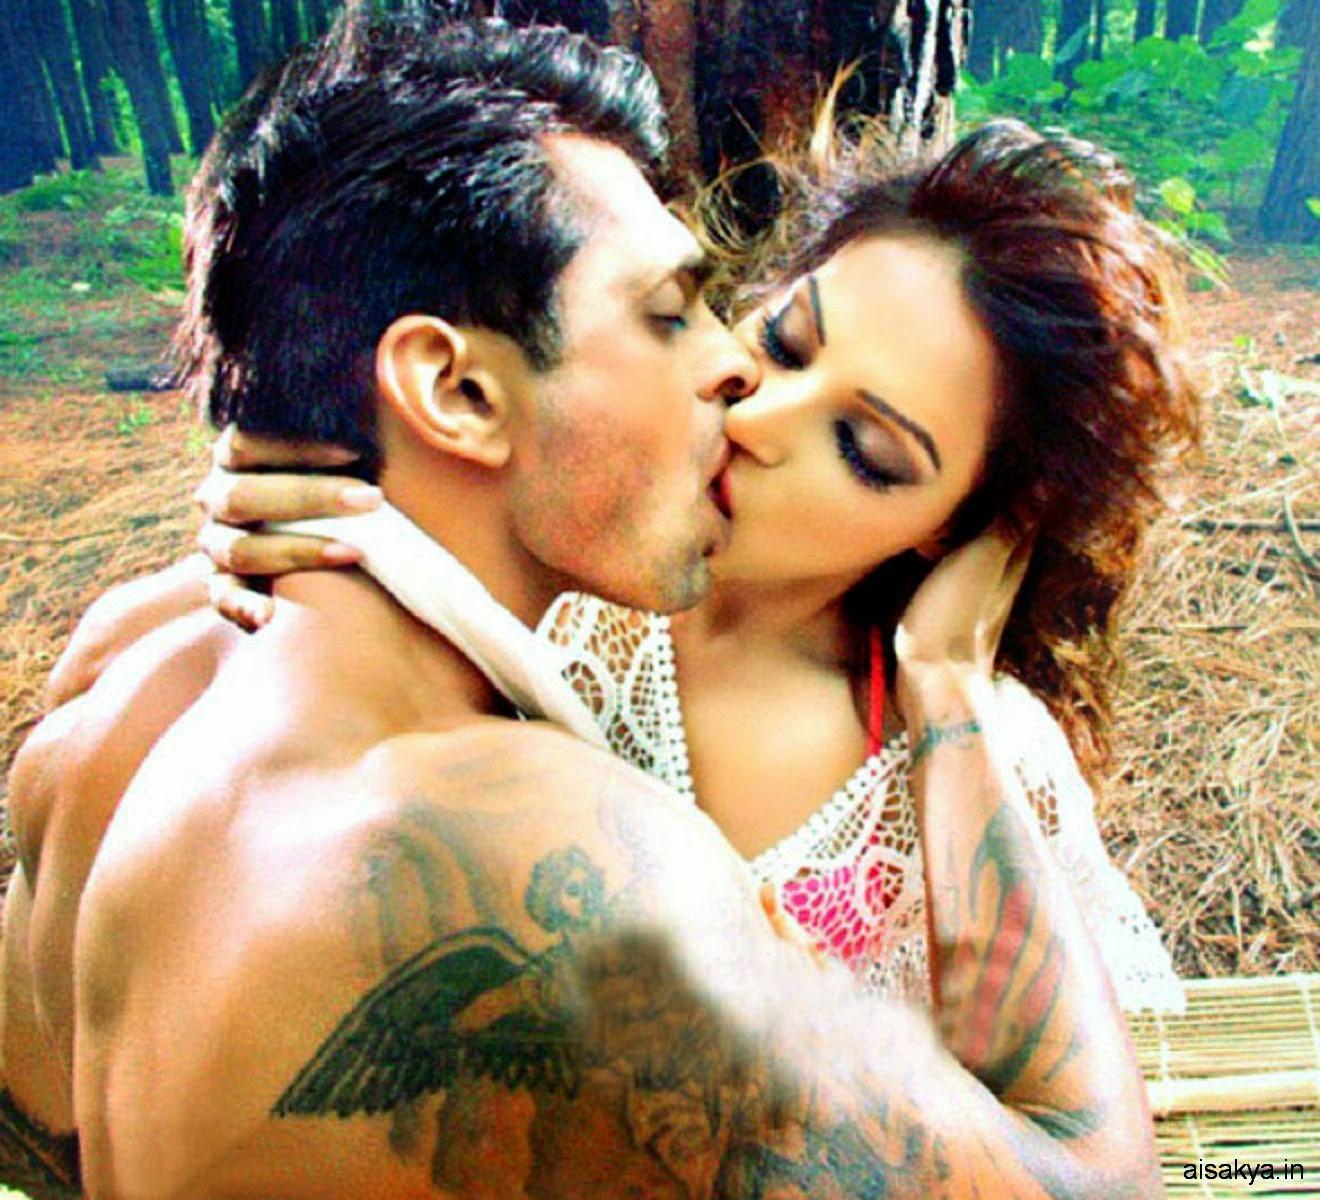 Bipasha basu kissing video